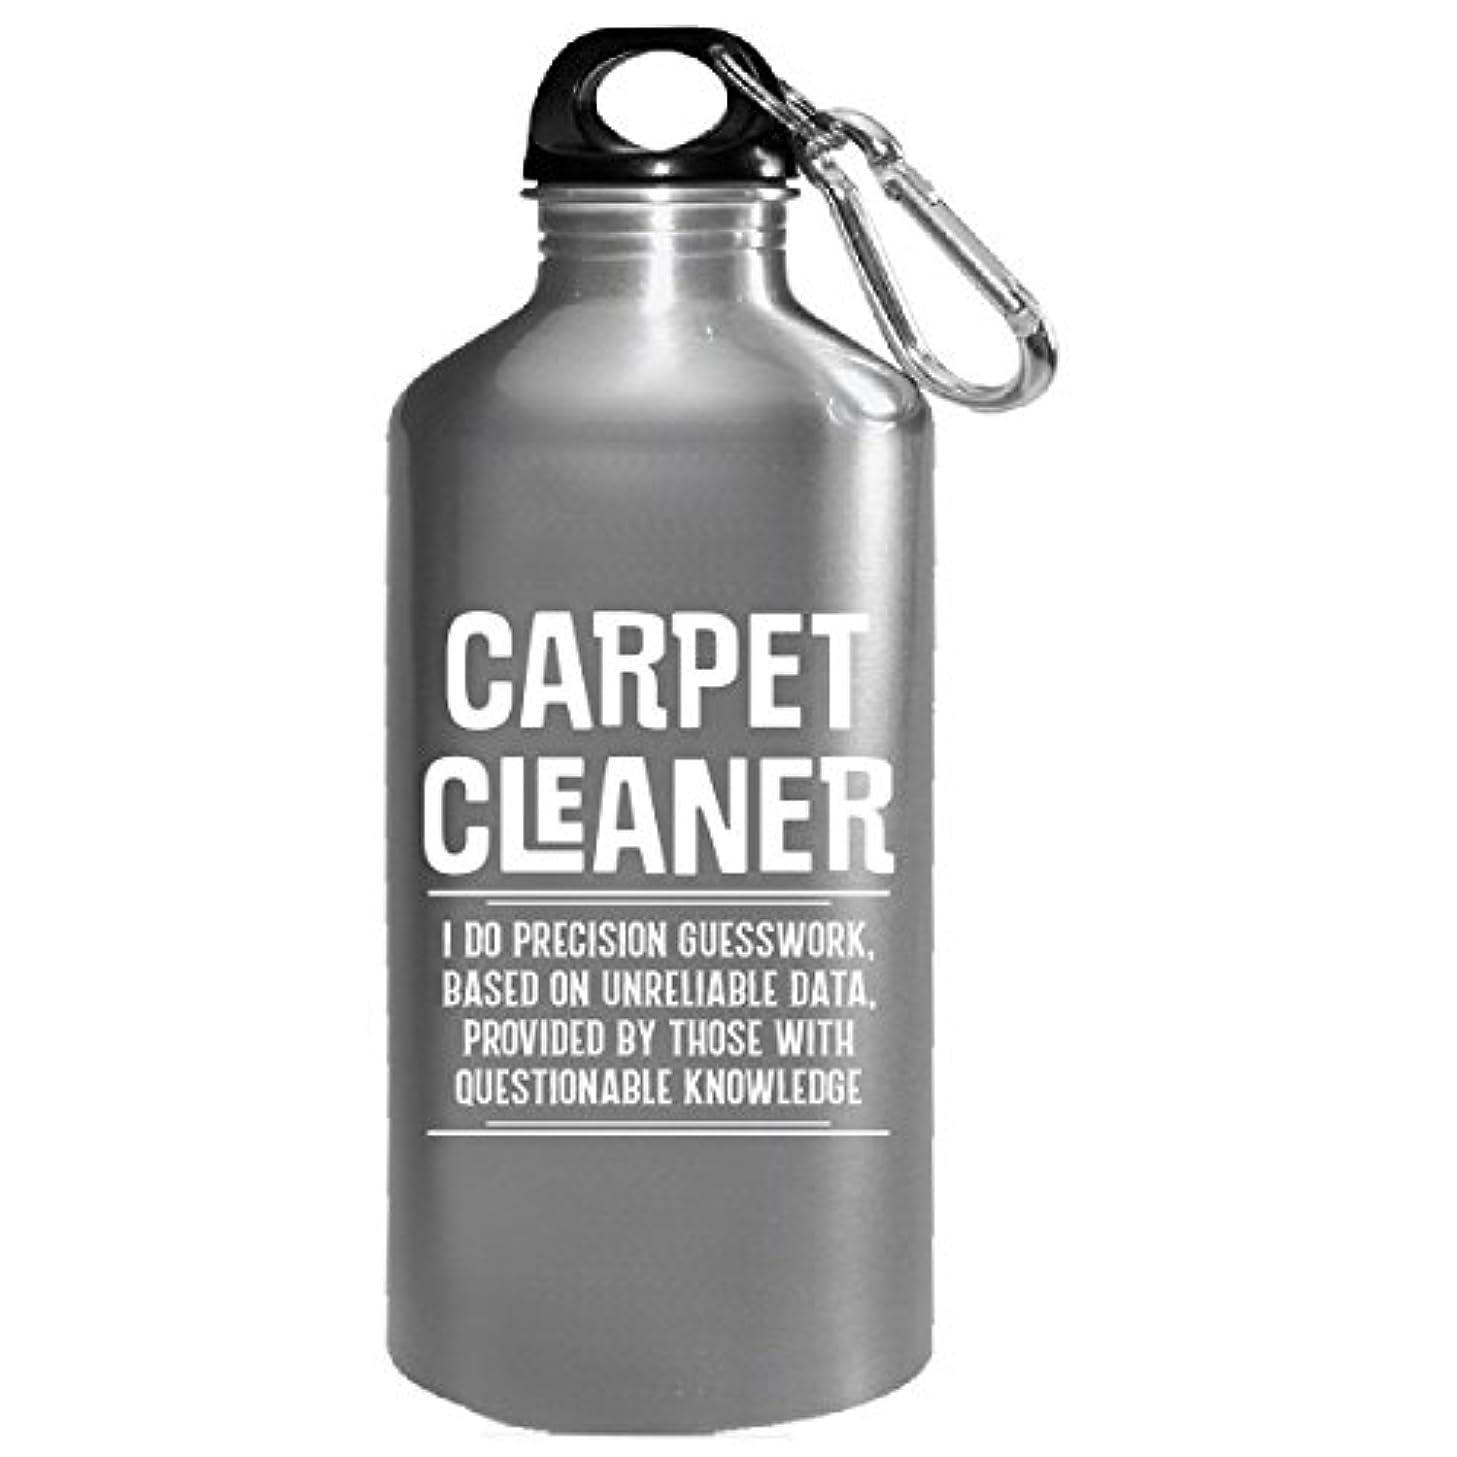 Carpet Cleaner I Do Precision Guesswork - Water Bottle